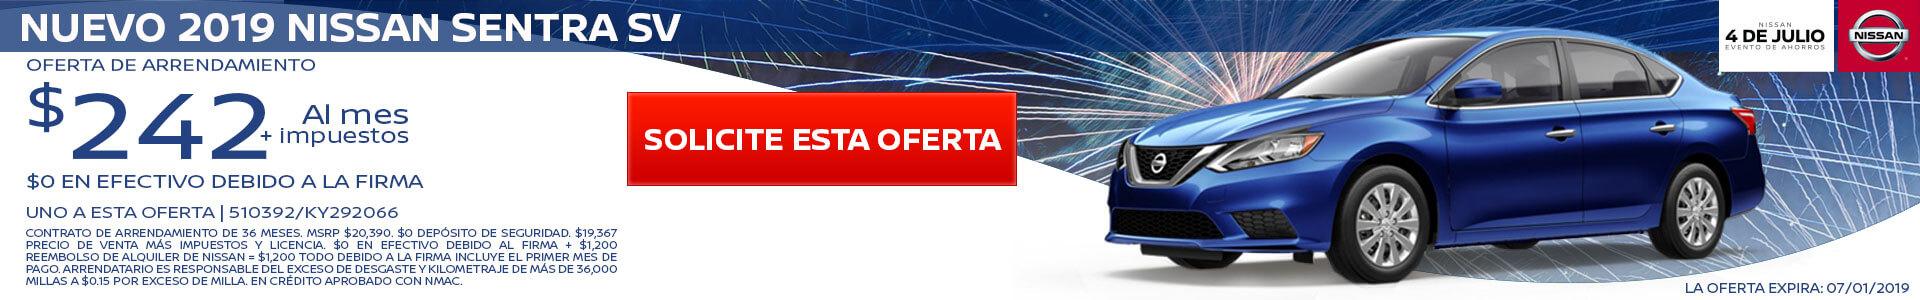 Sentra Finance